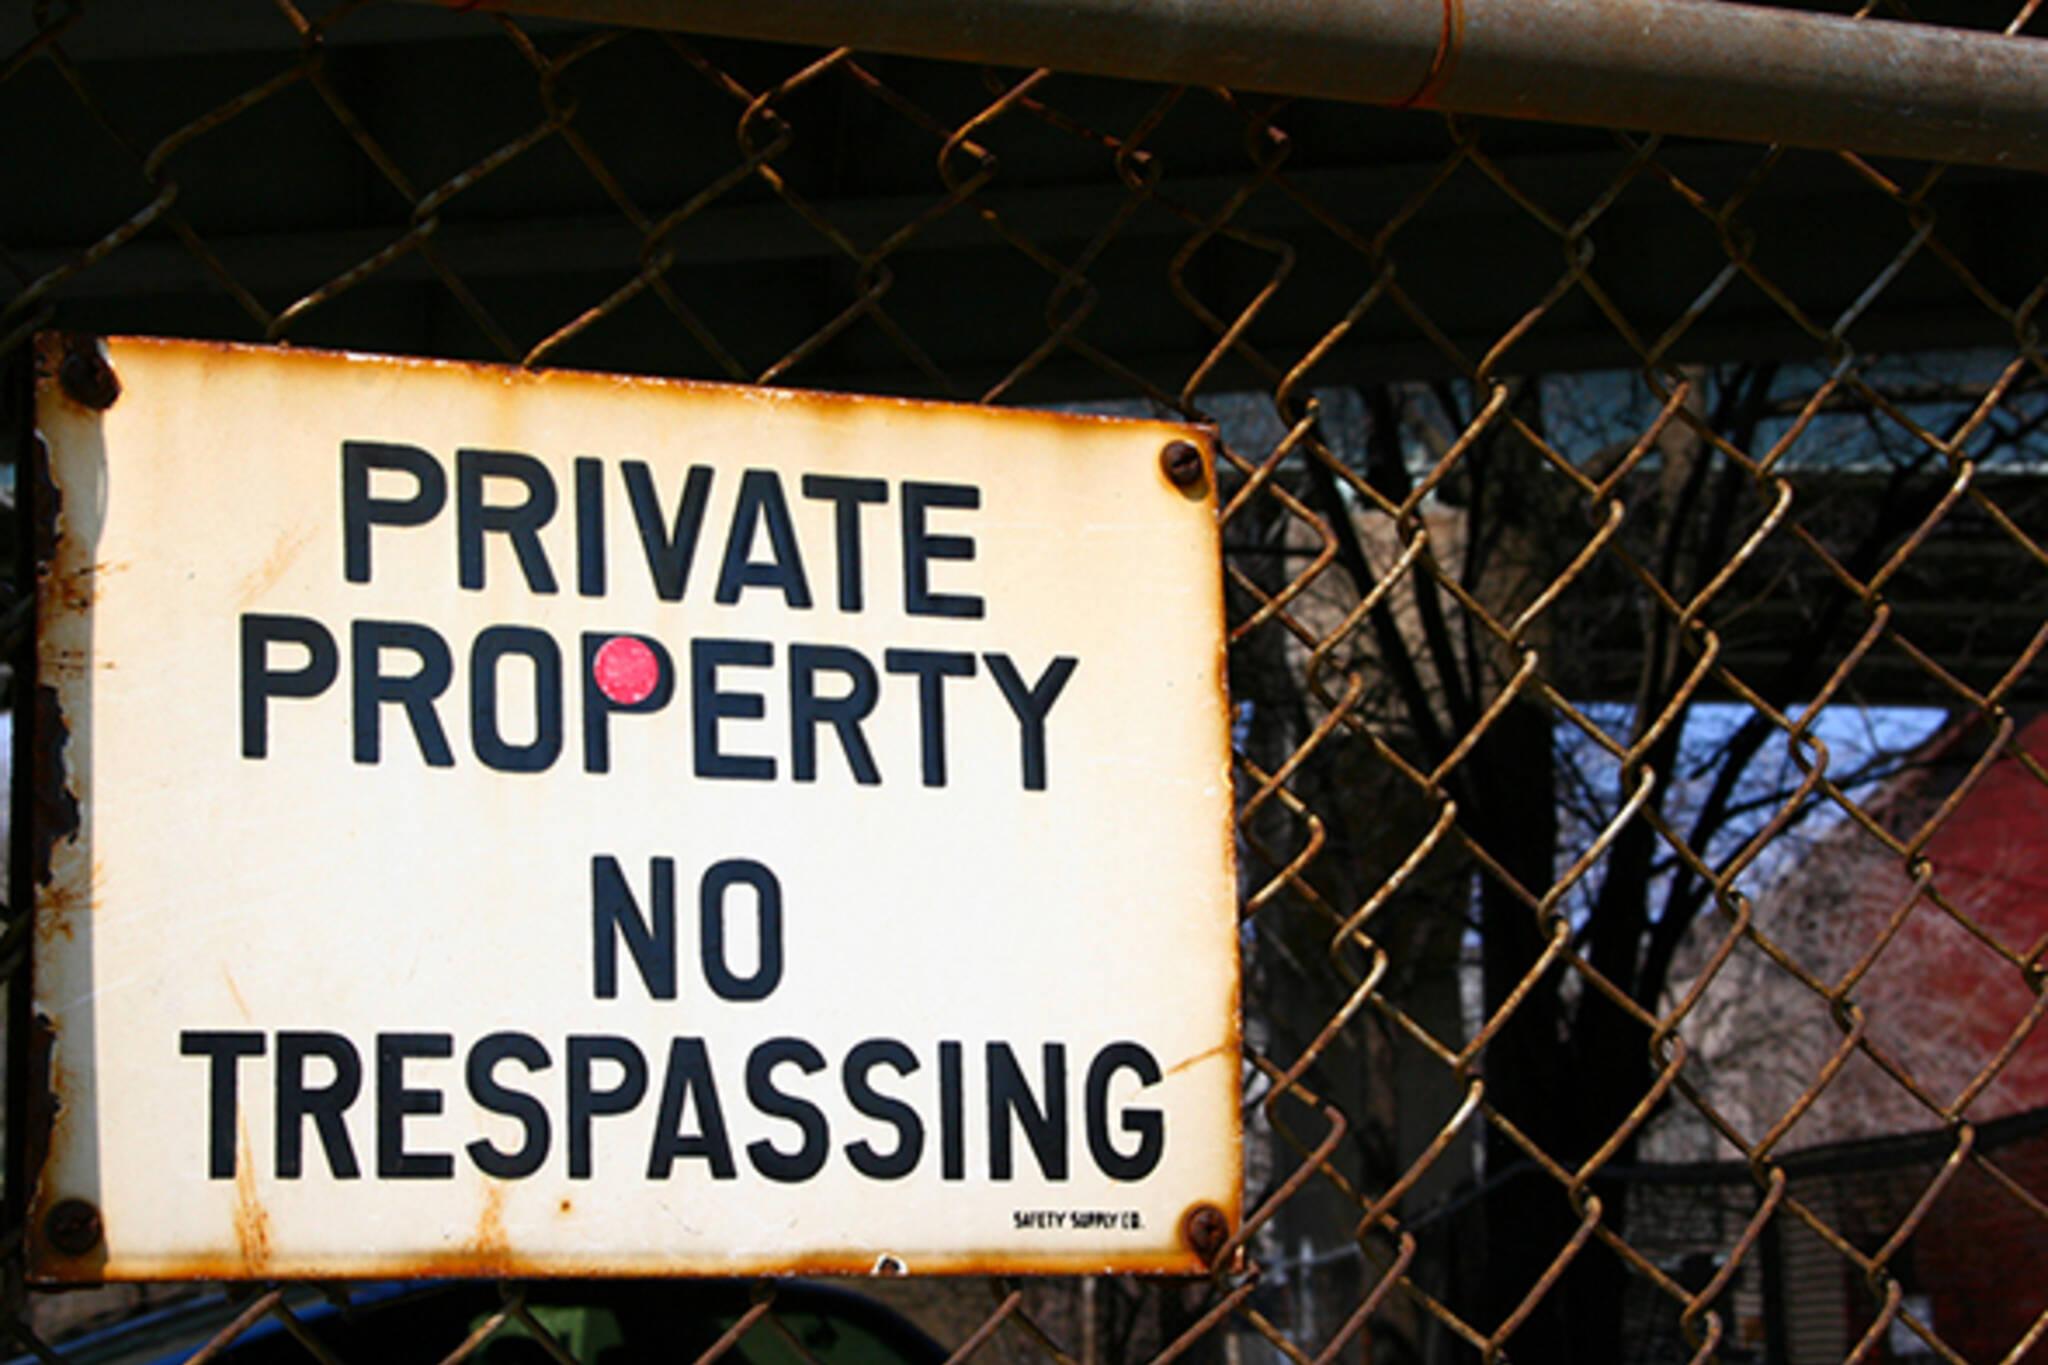 Private property toronto